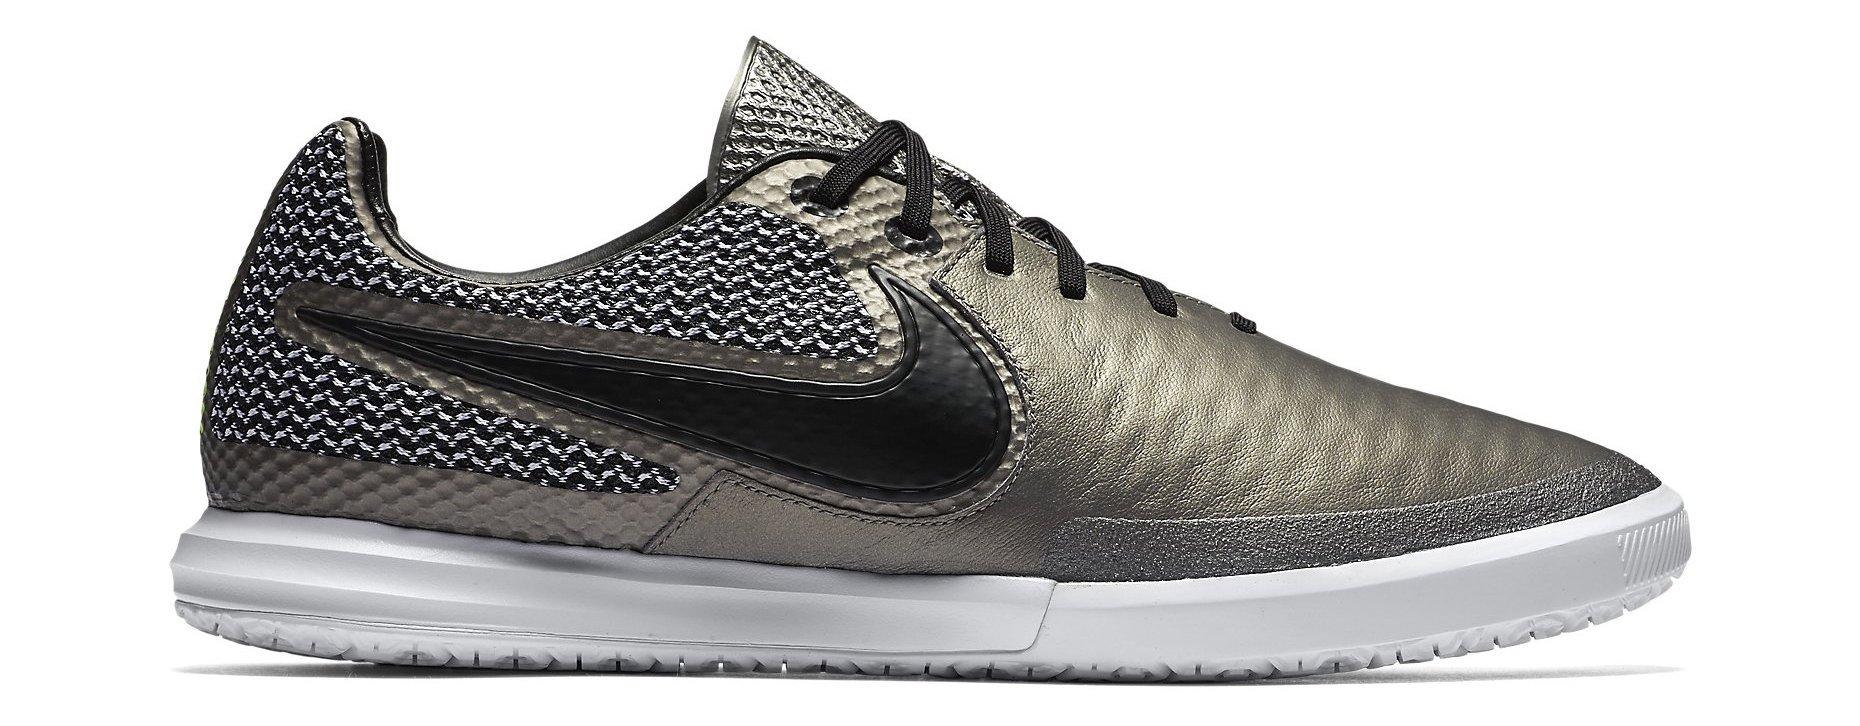 7fd0370a9f8 Sálovky Nike MAGISTAX FINALE IC